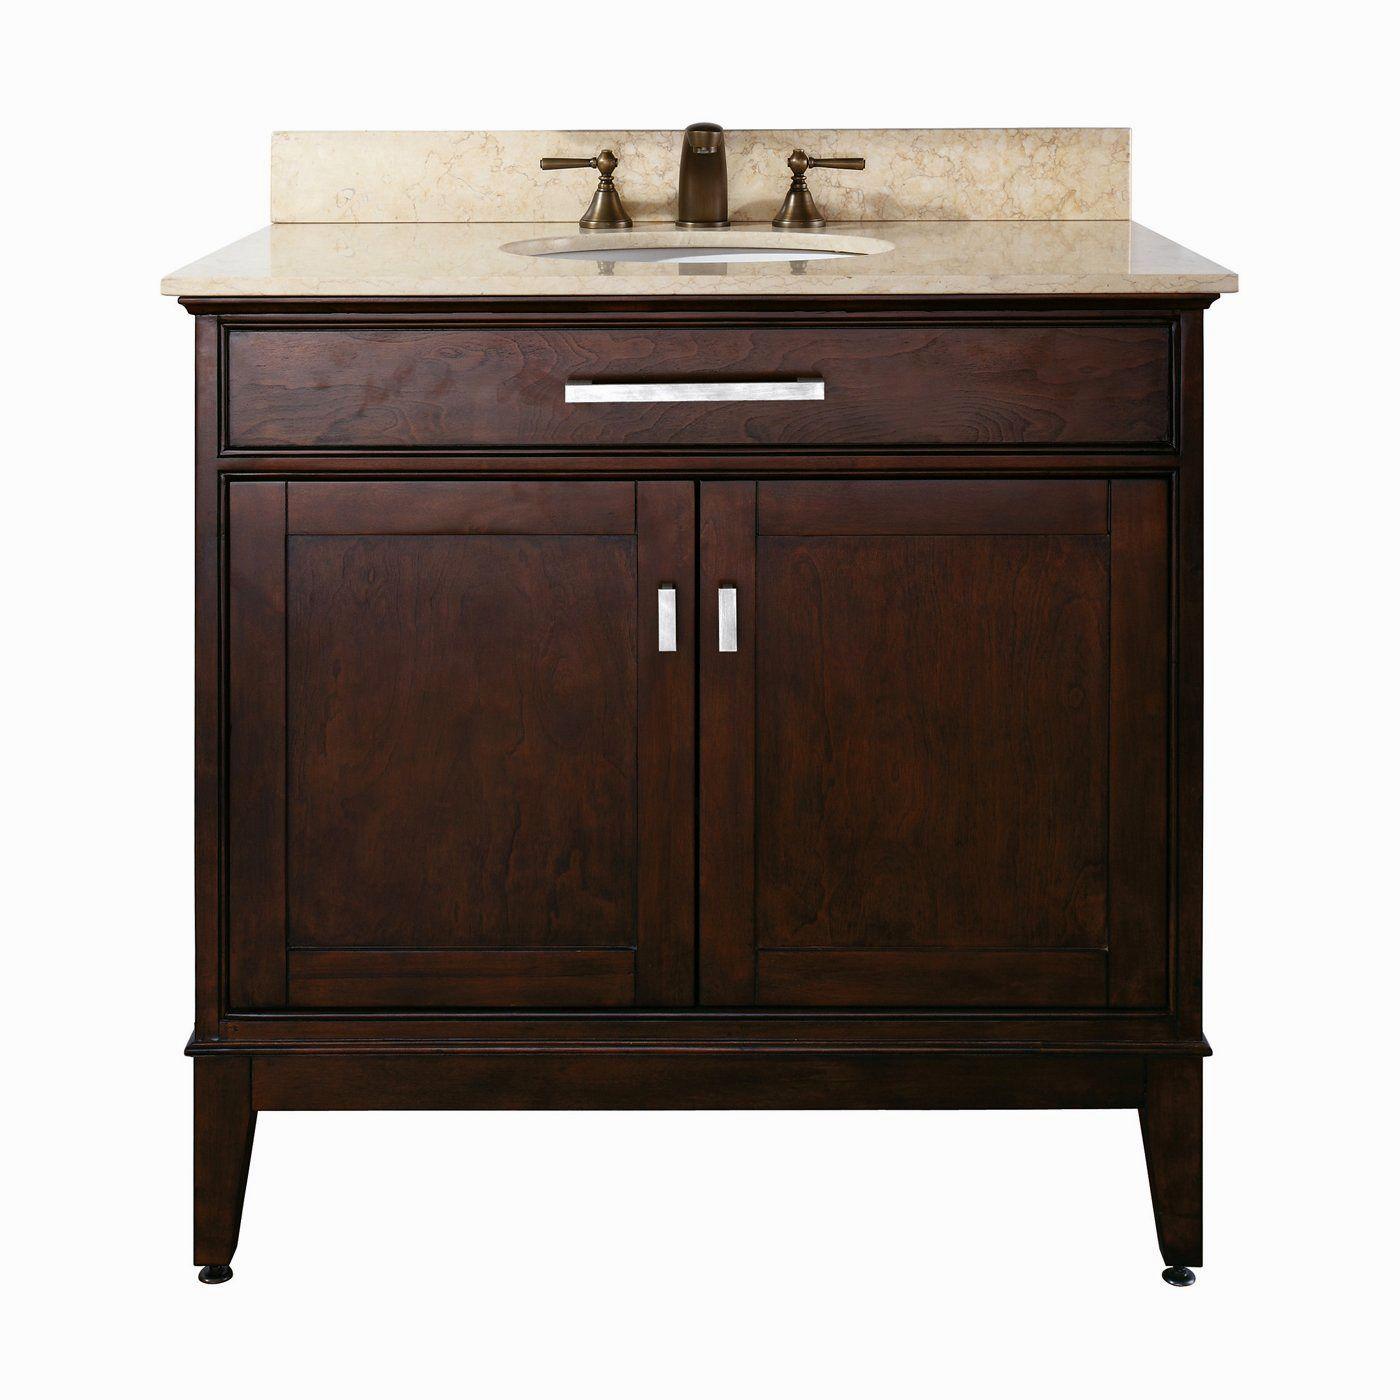 excellent 24 inch bathroom vanity cabinet construction-Best Of 24 Inch Bathroom Vanity Cabinet Inspiration